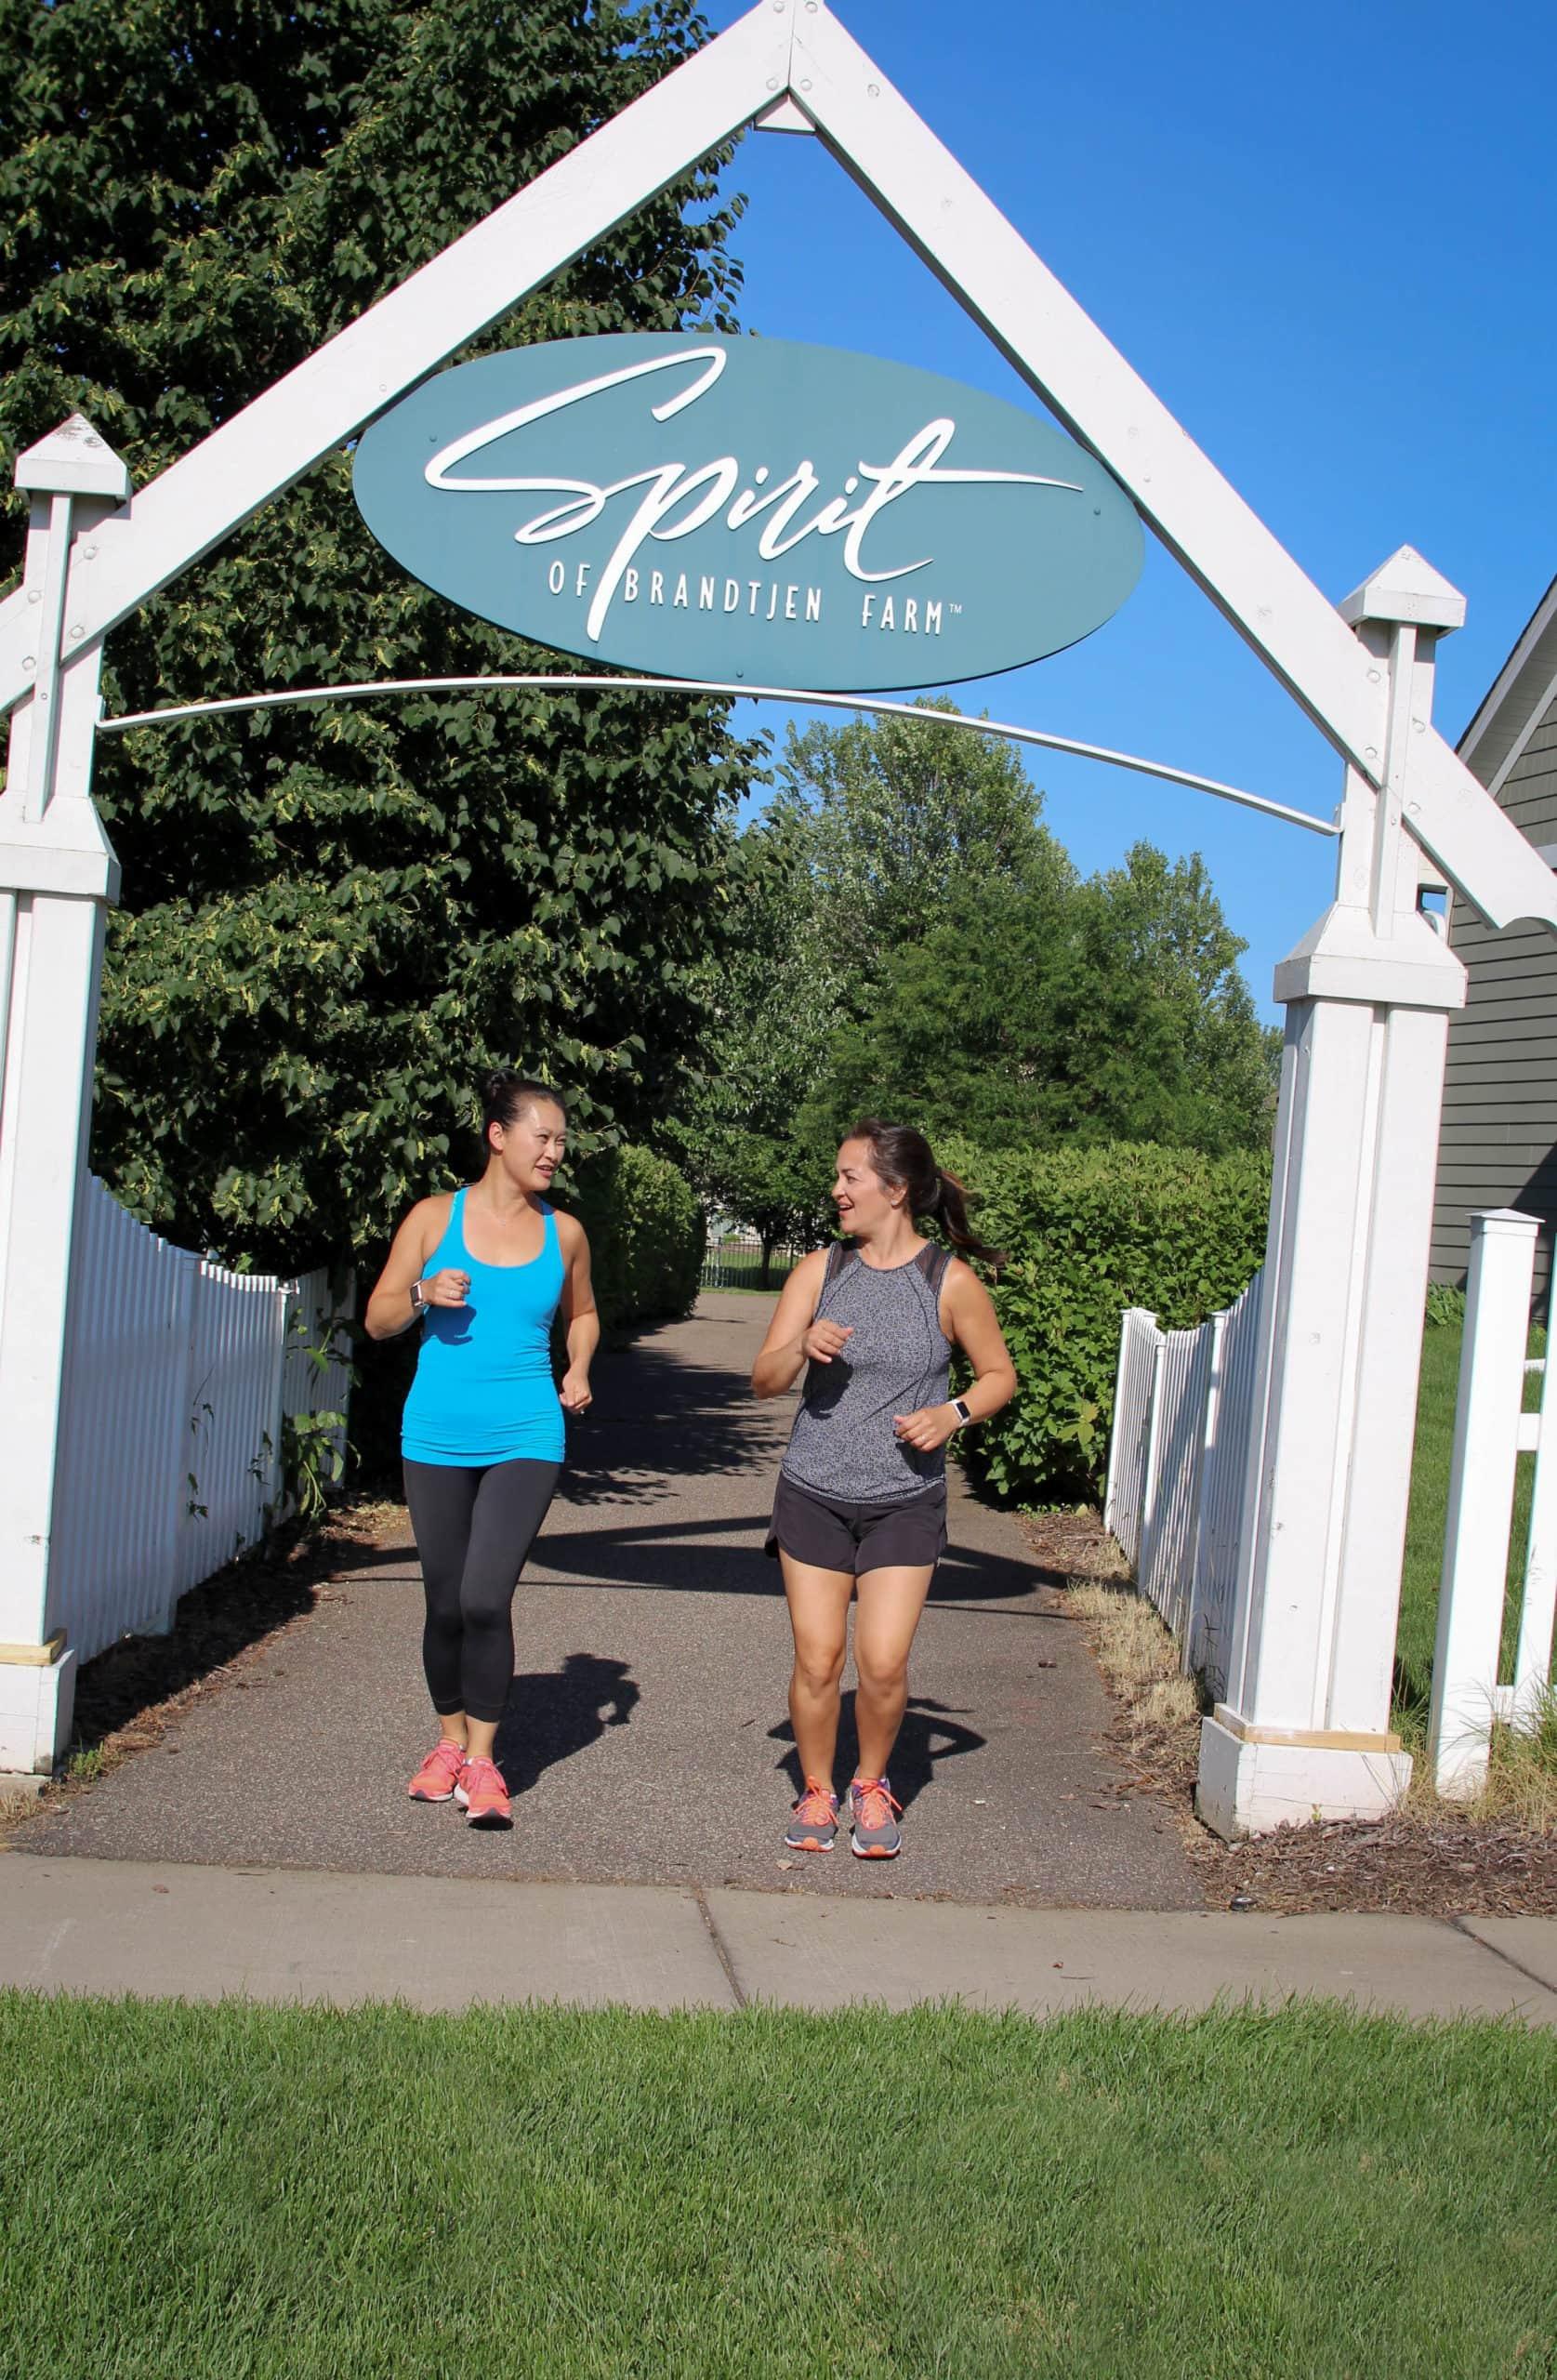 Spirit Of Brandtjen Farms Trail Systems